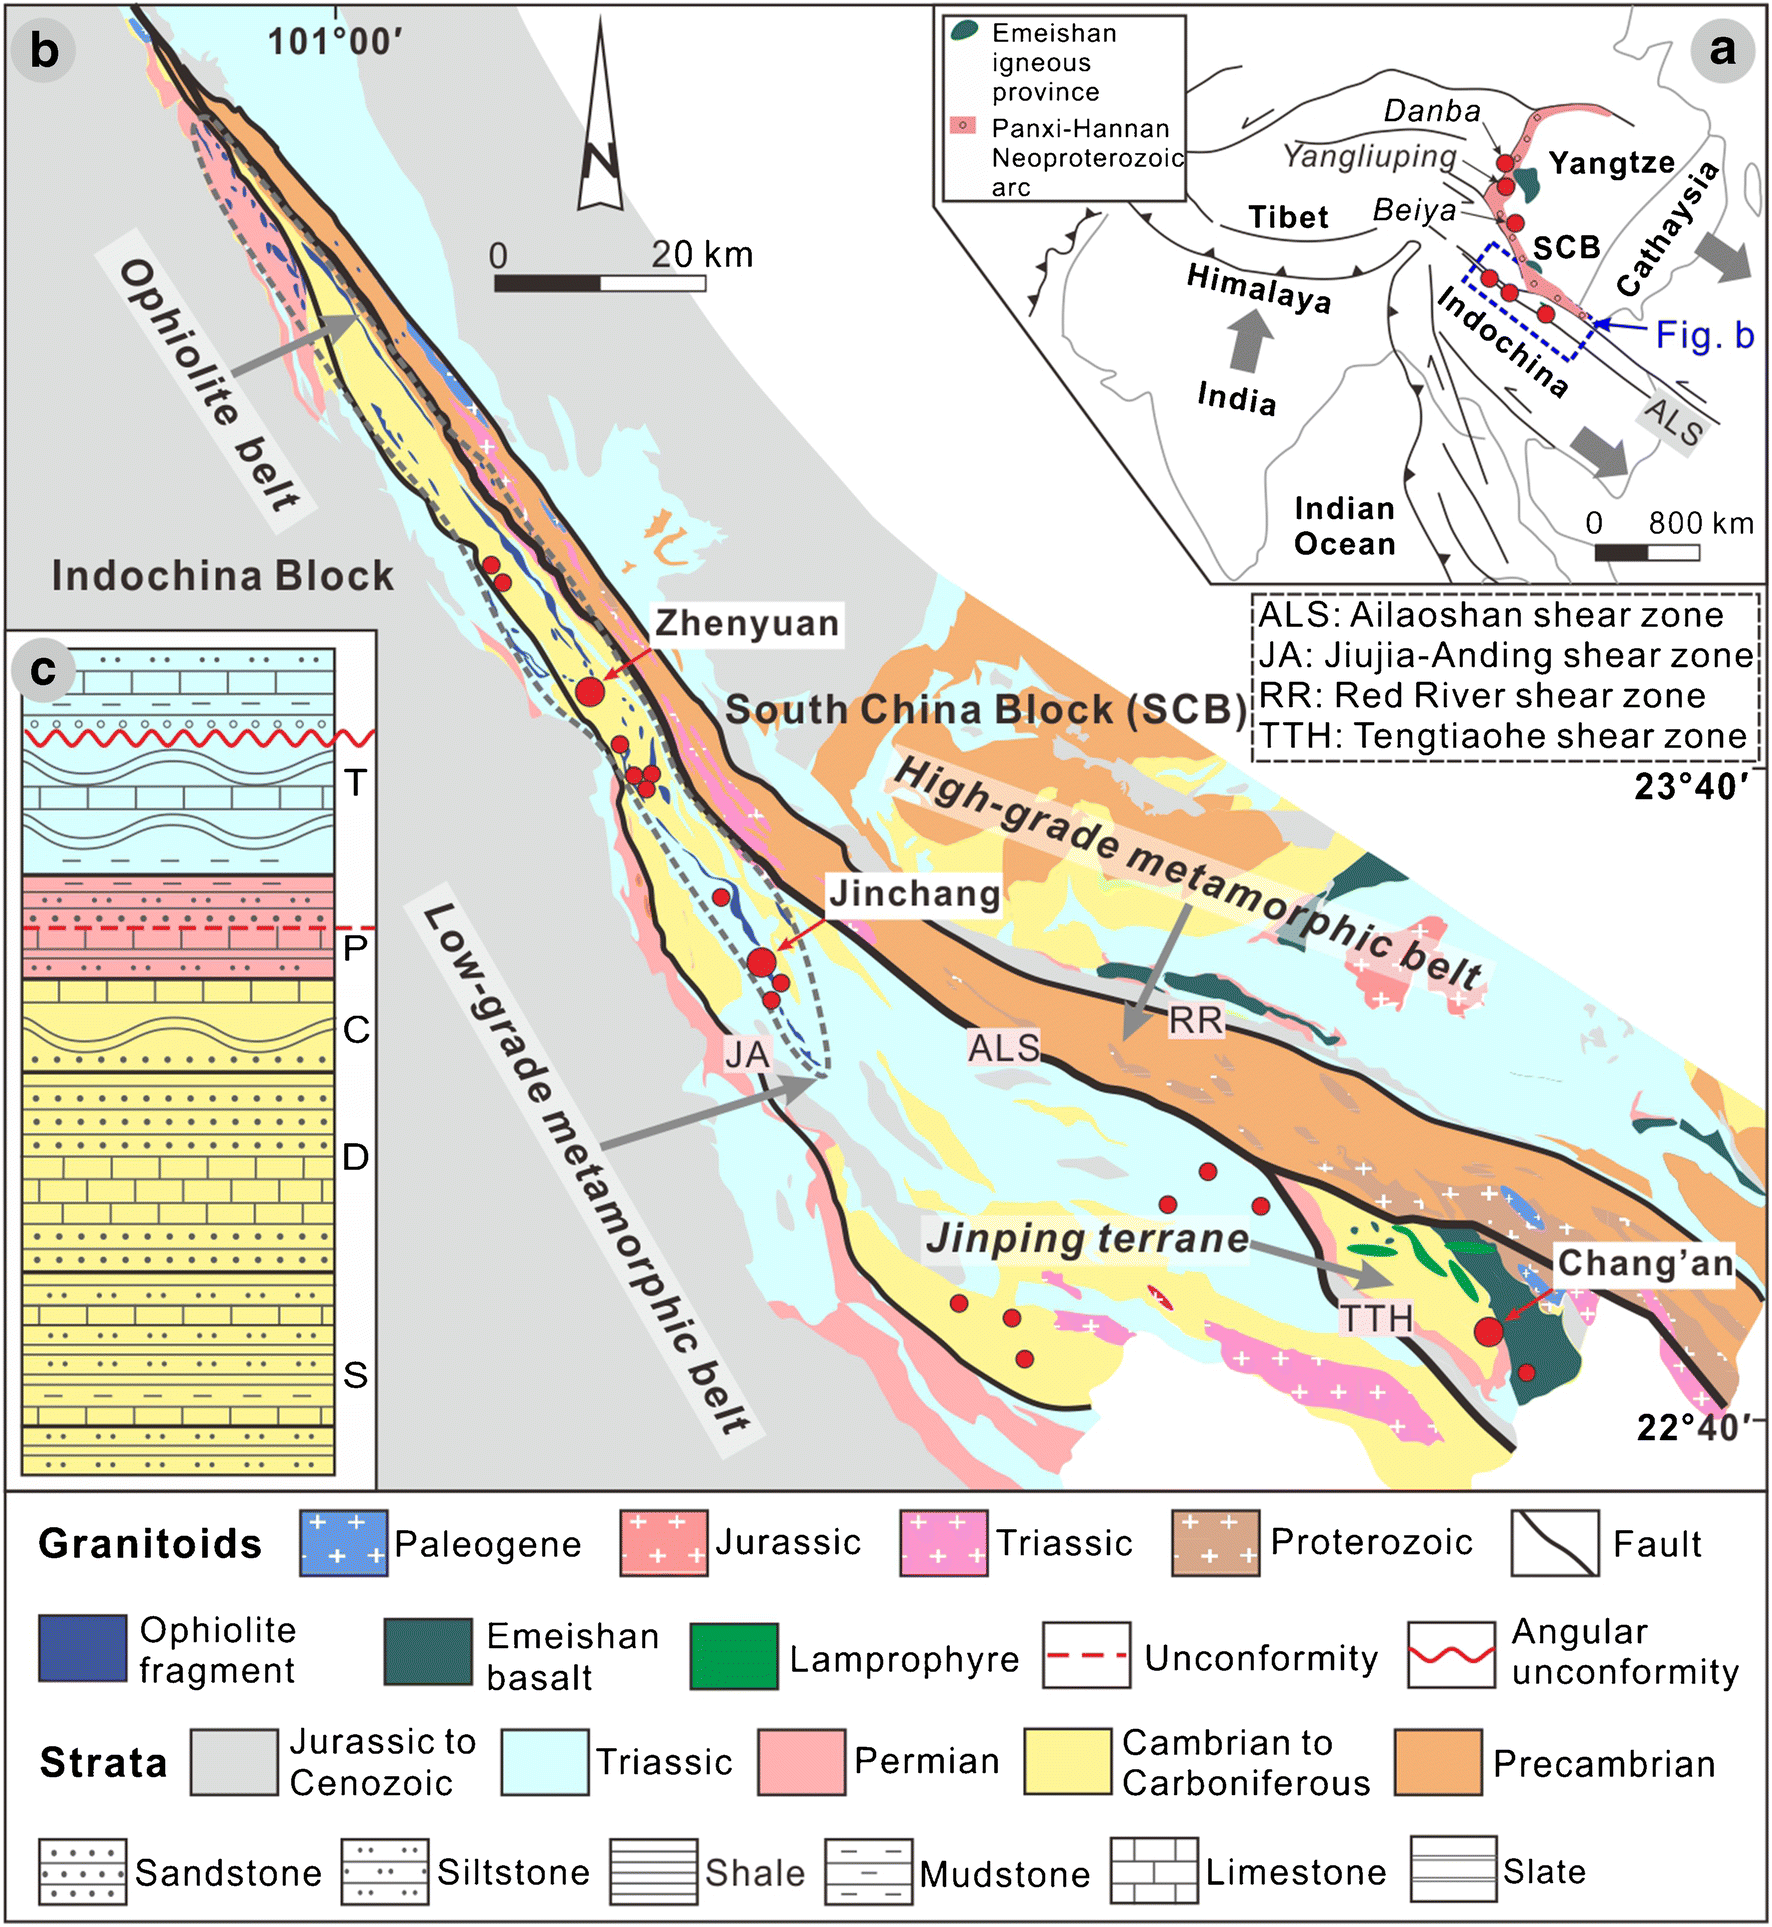 Evolution of the Miocene Ailaoshan orogenic gold deposits